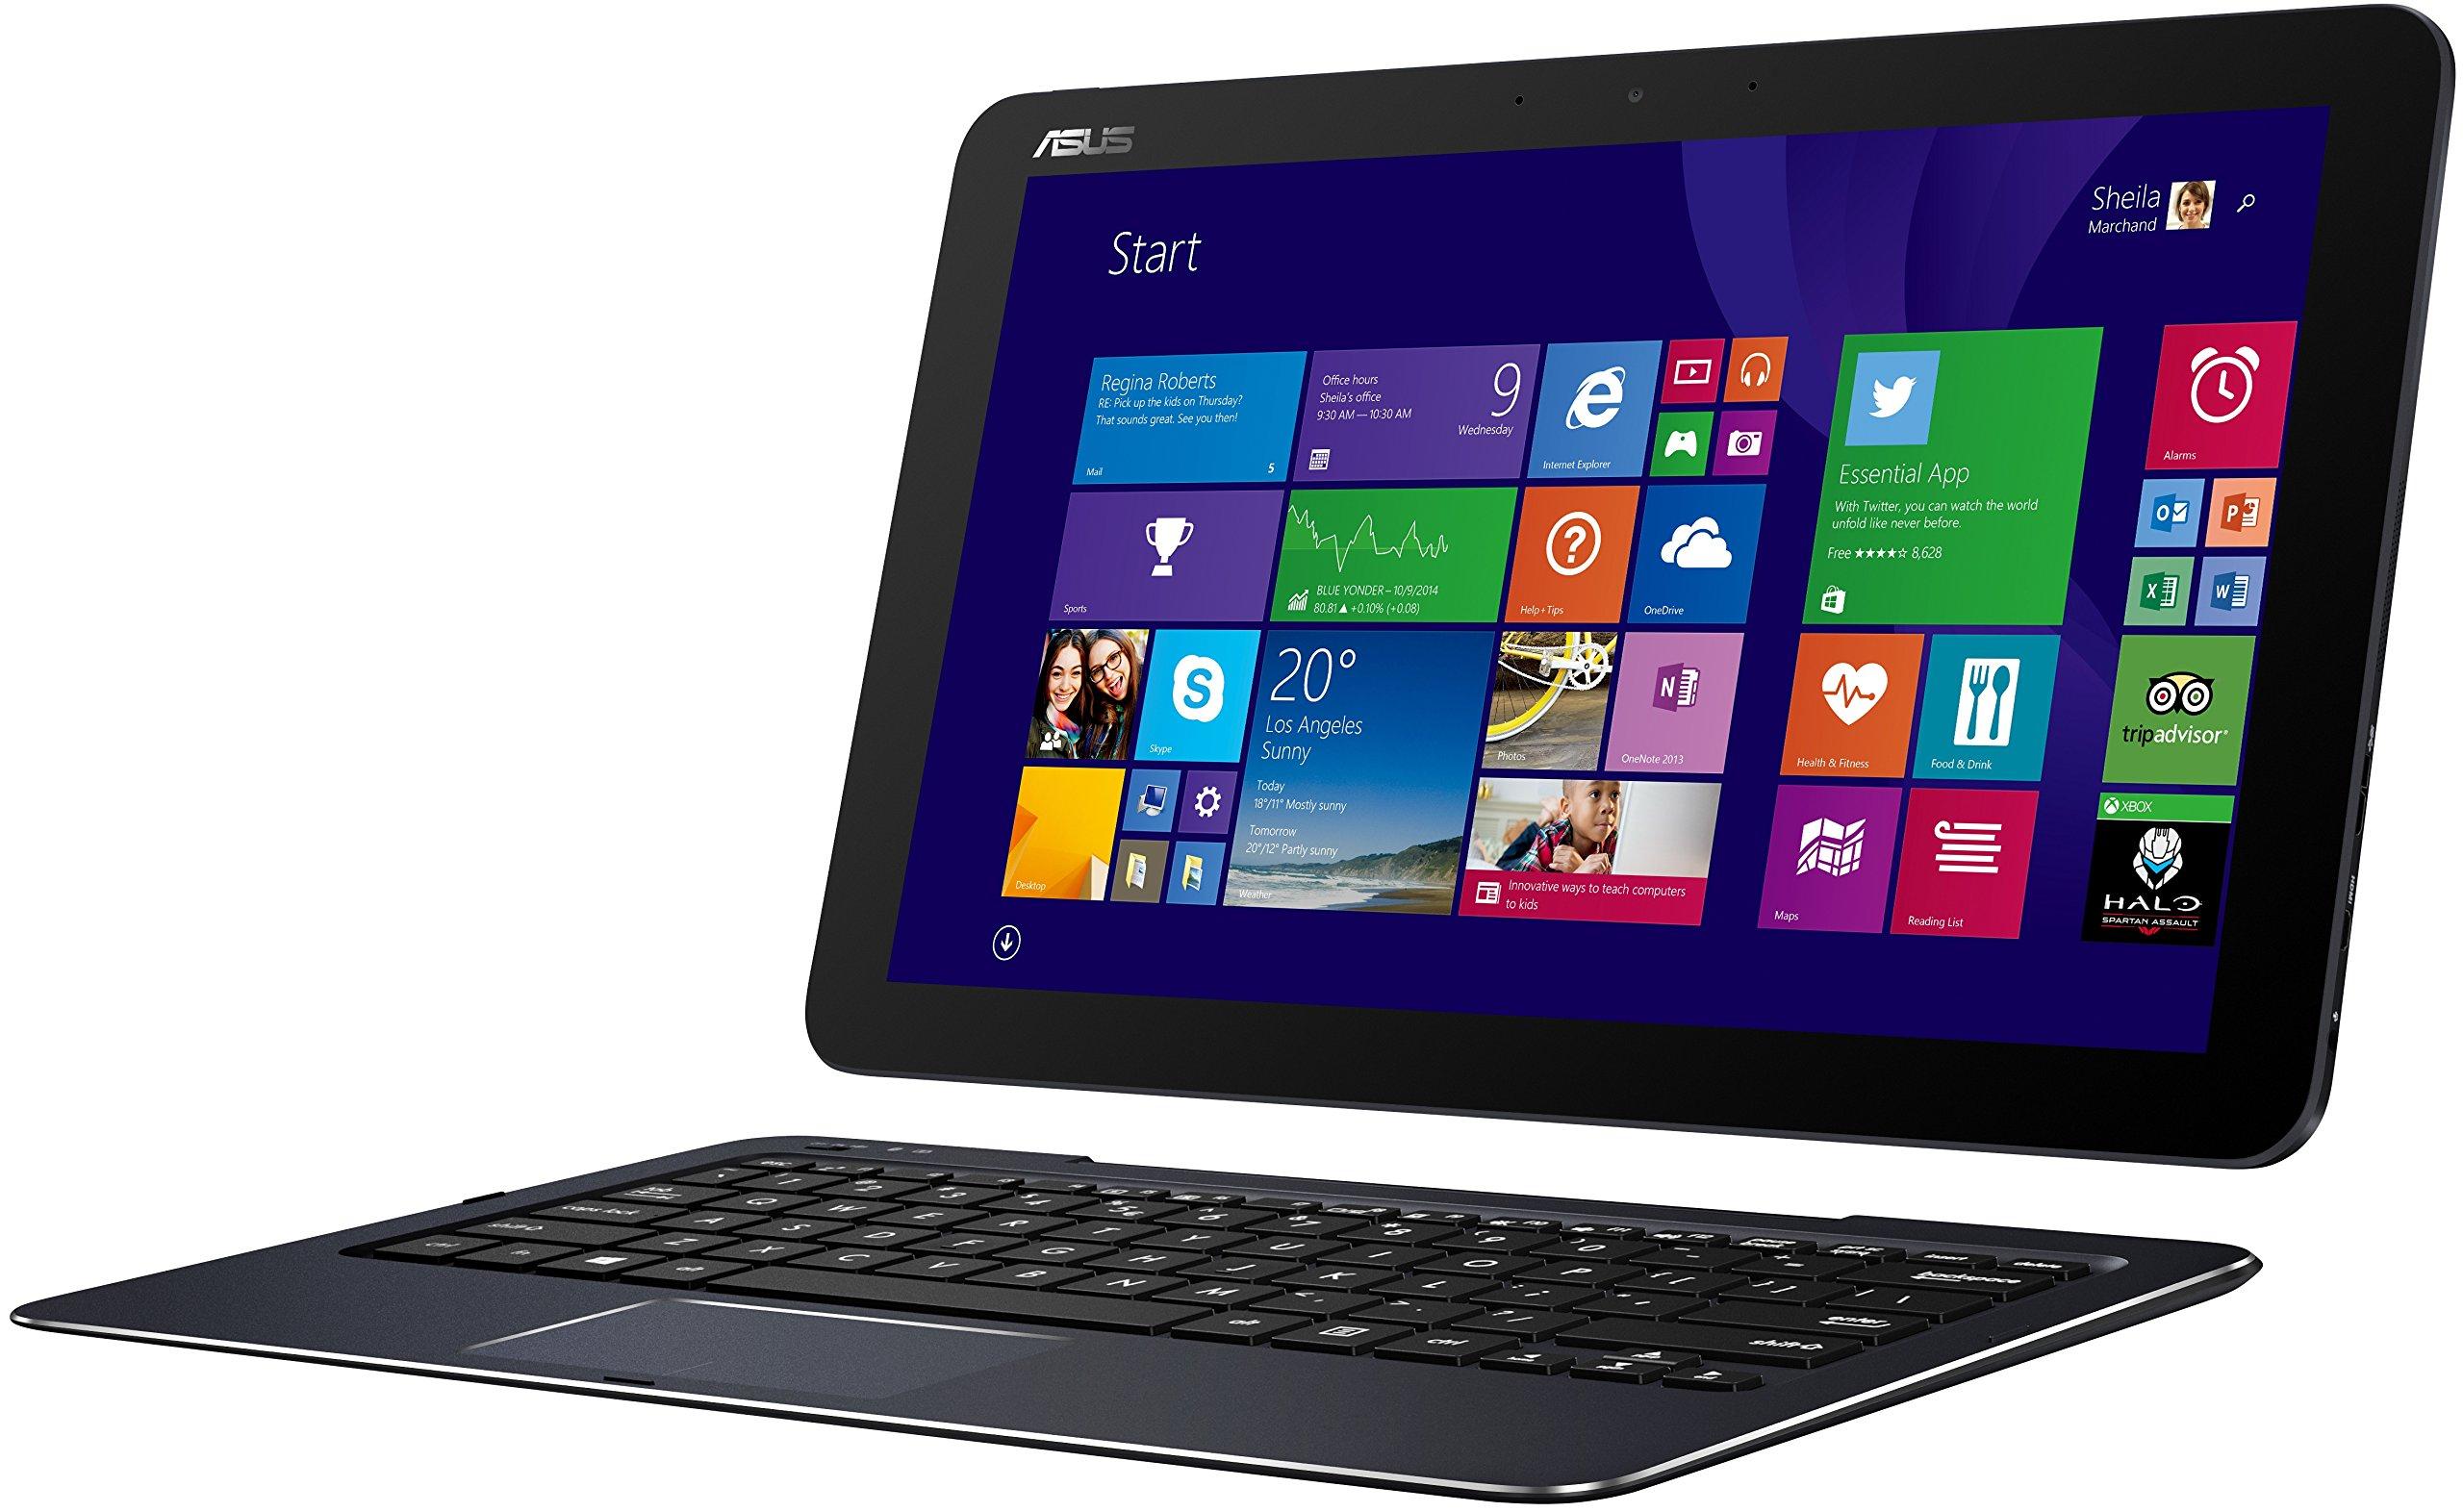 Asus BM5320 Desktop PC Drivers Download (2019)